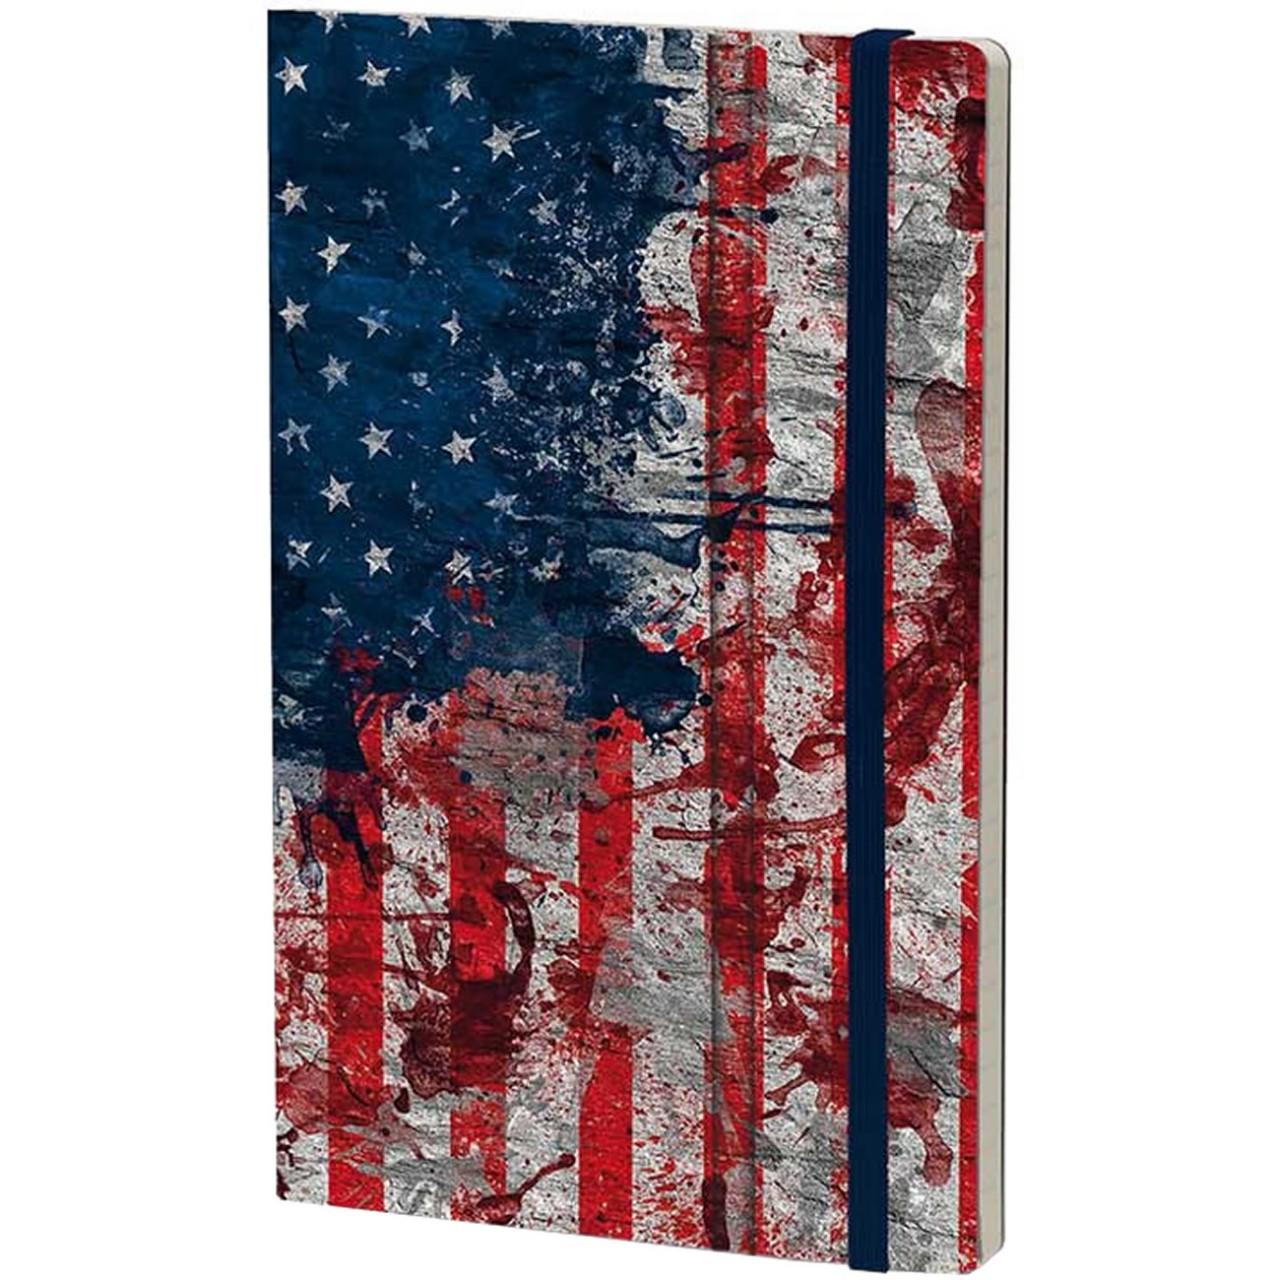 Stifflex Notizbuch HISTORICAL NOTES 9 x 14 cm 144 S., I HAVE A DREAM (USA Flag)